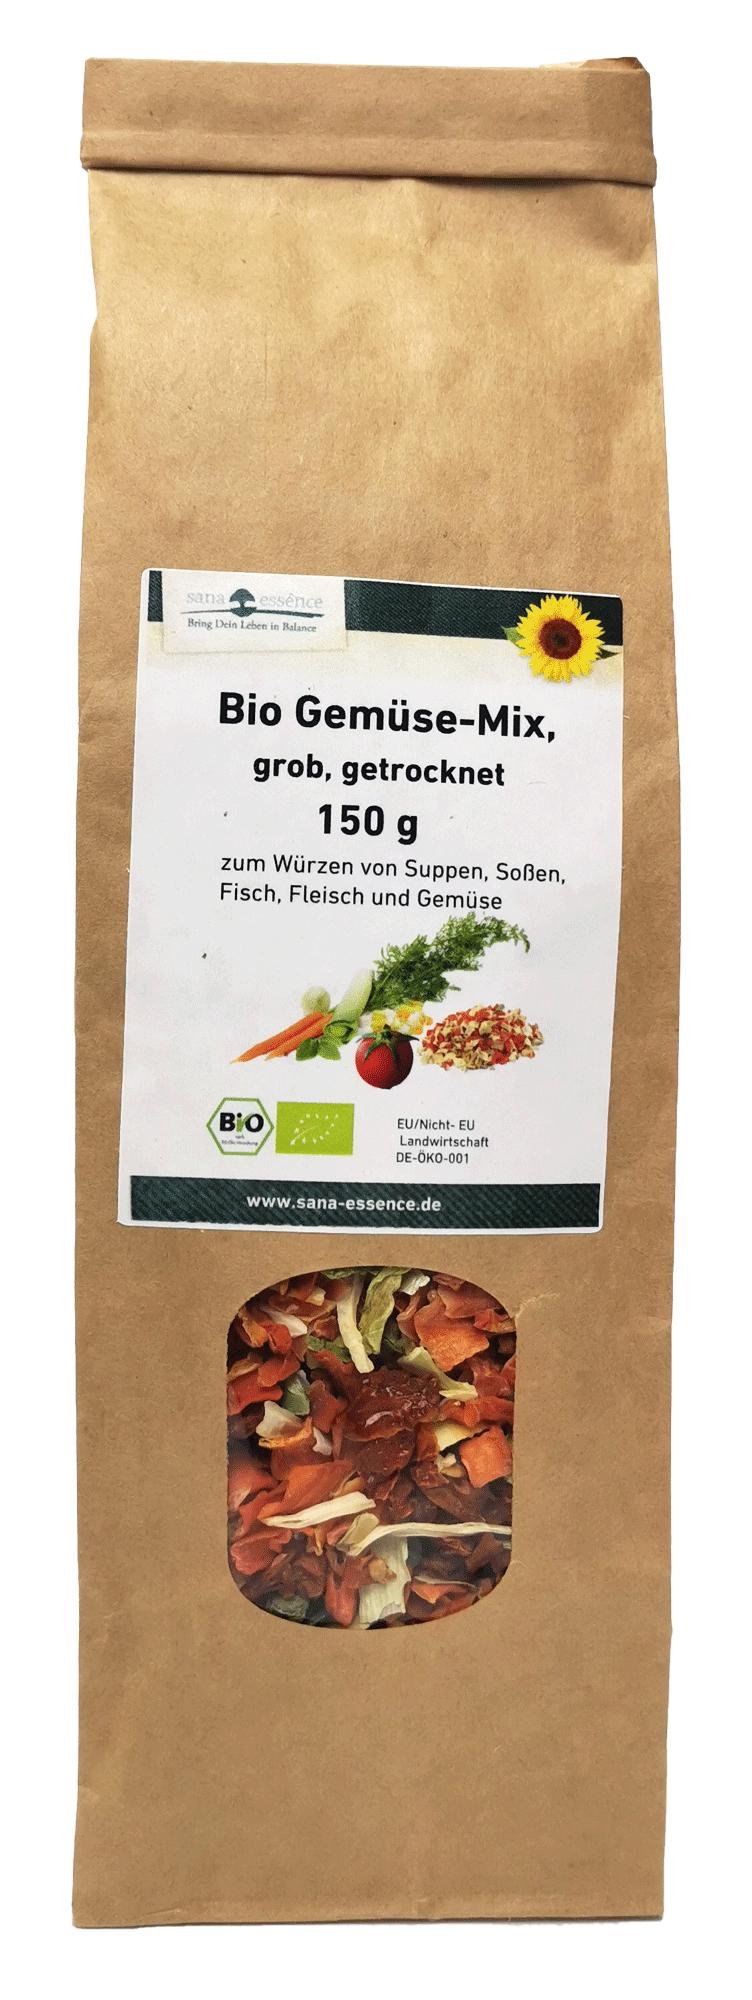 Bio Gemüse-Mix, getrocknet